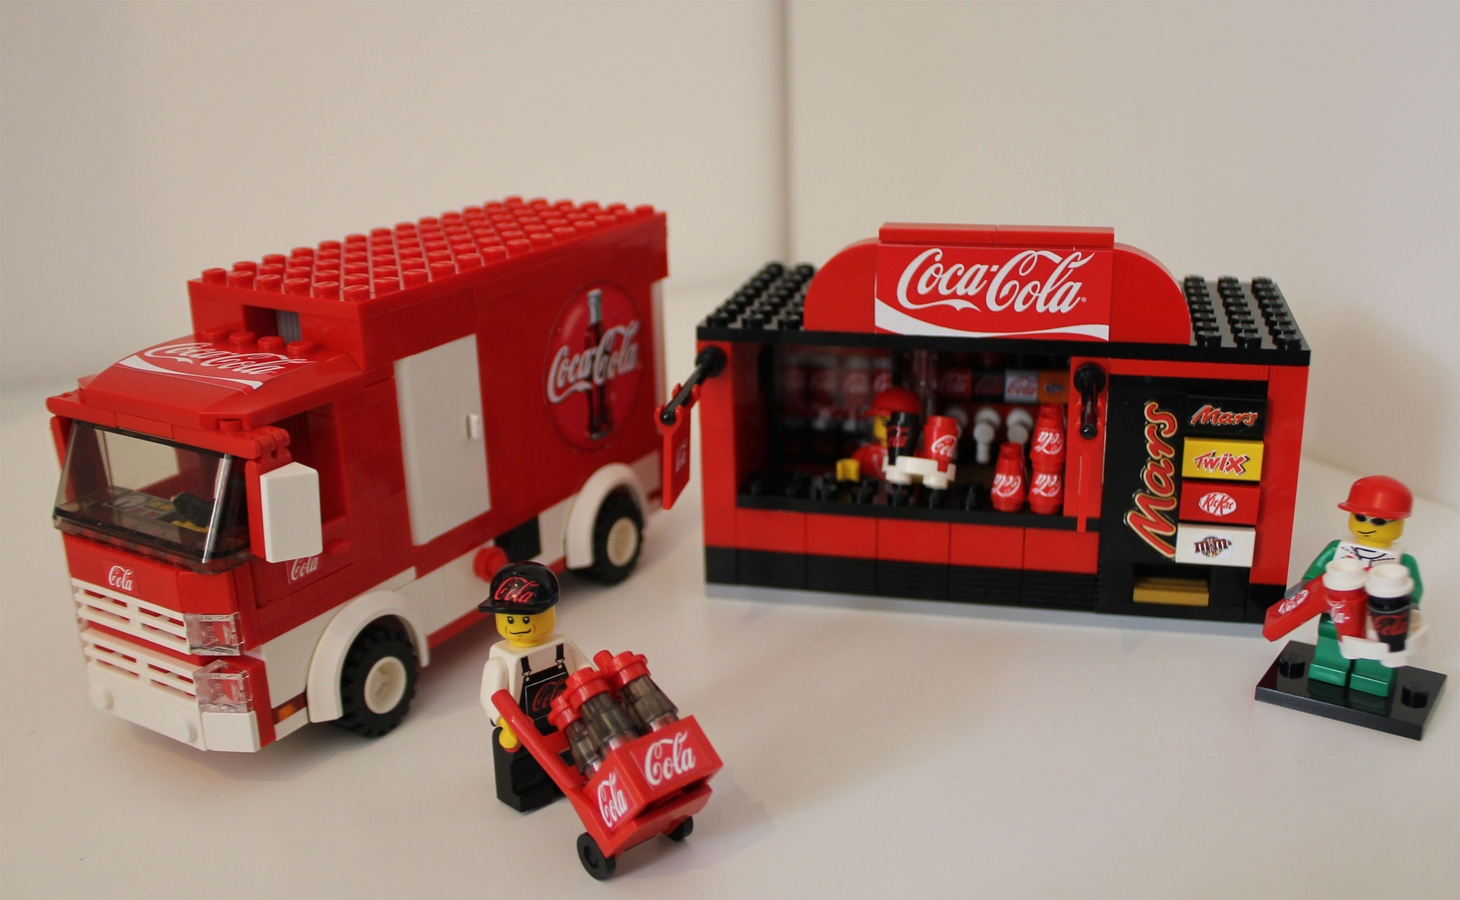 Coca Cola Gifts >> Lego Ideas Product Ideas Coca Cola Shop